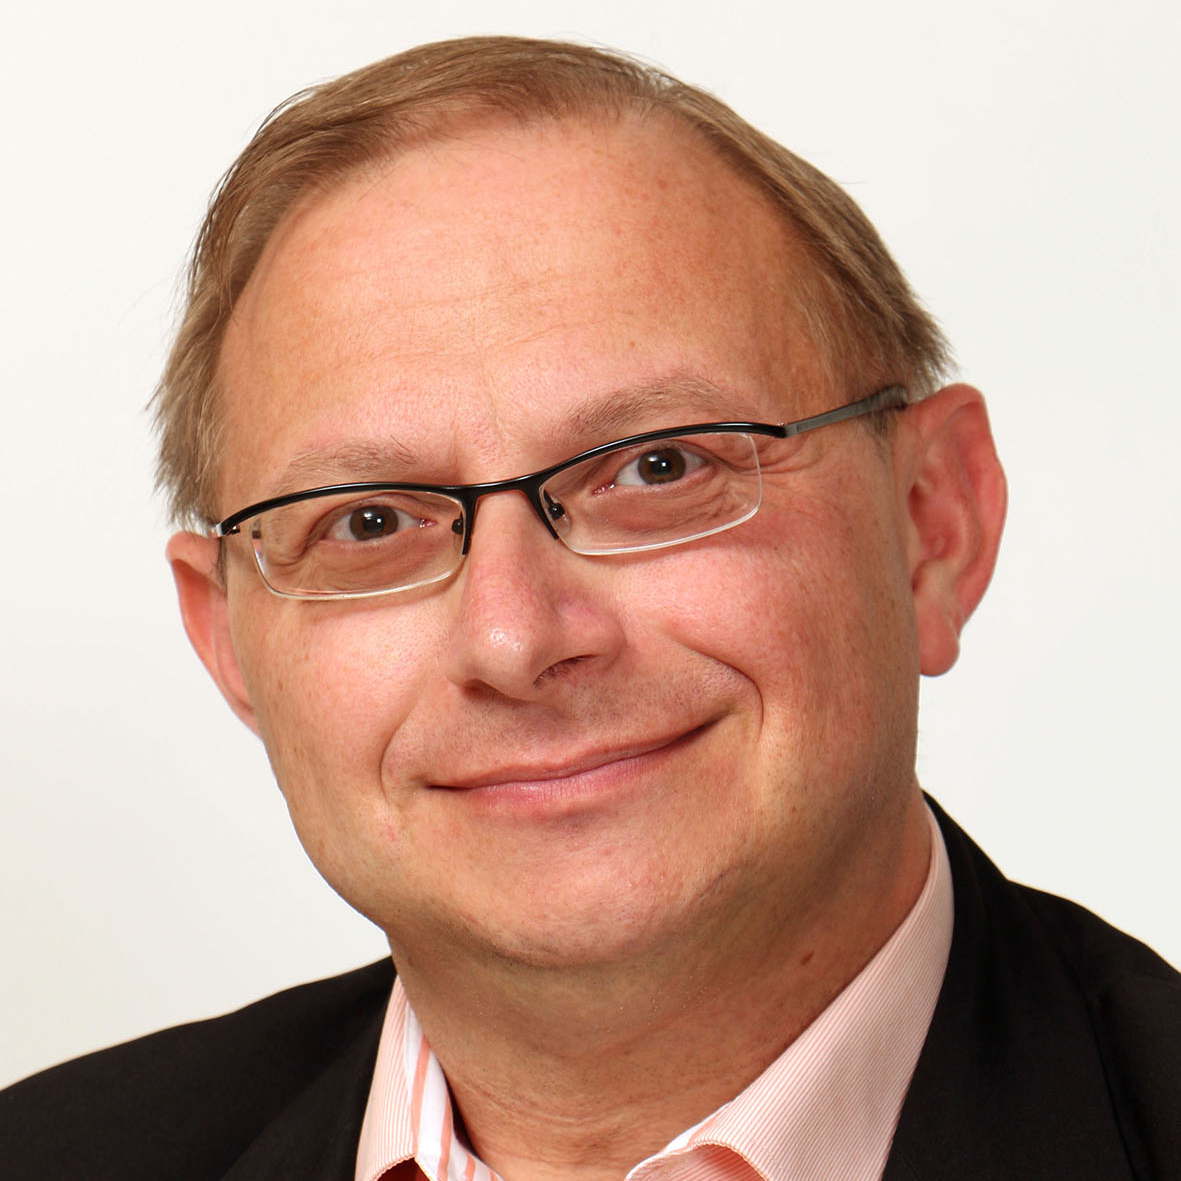 John van Hal